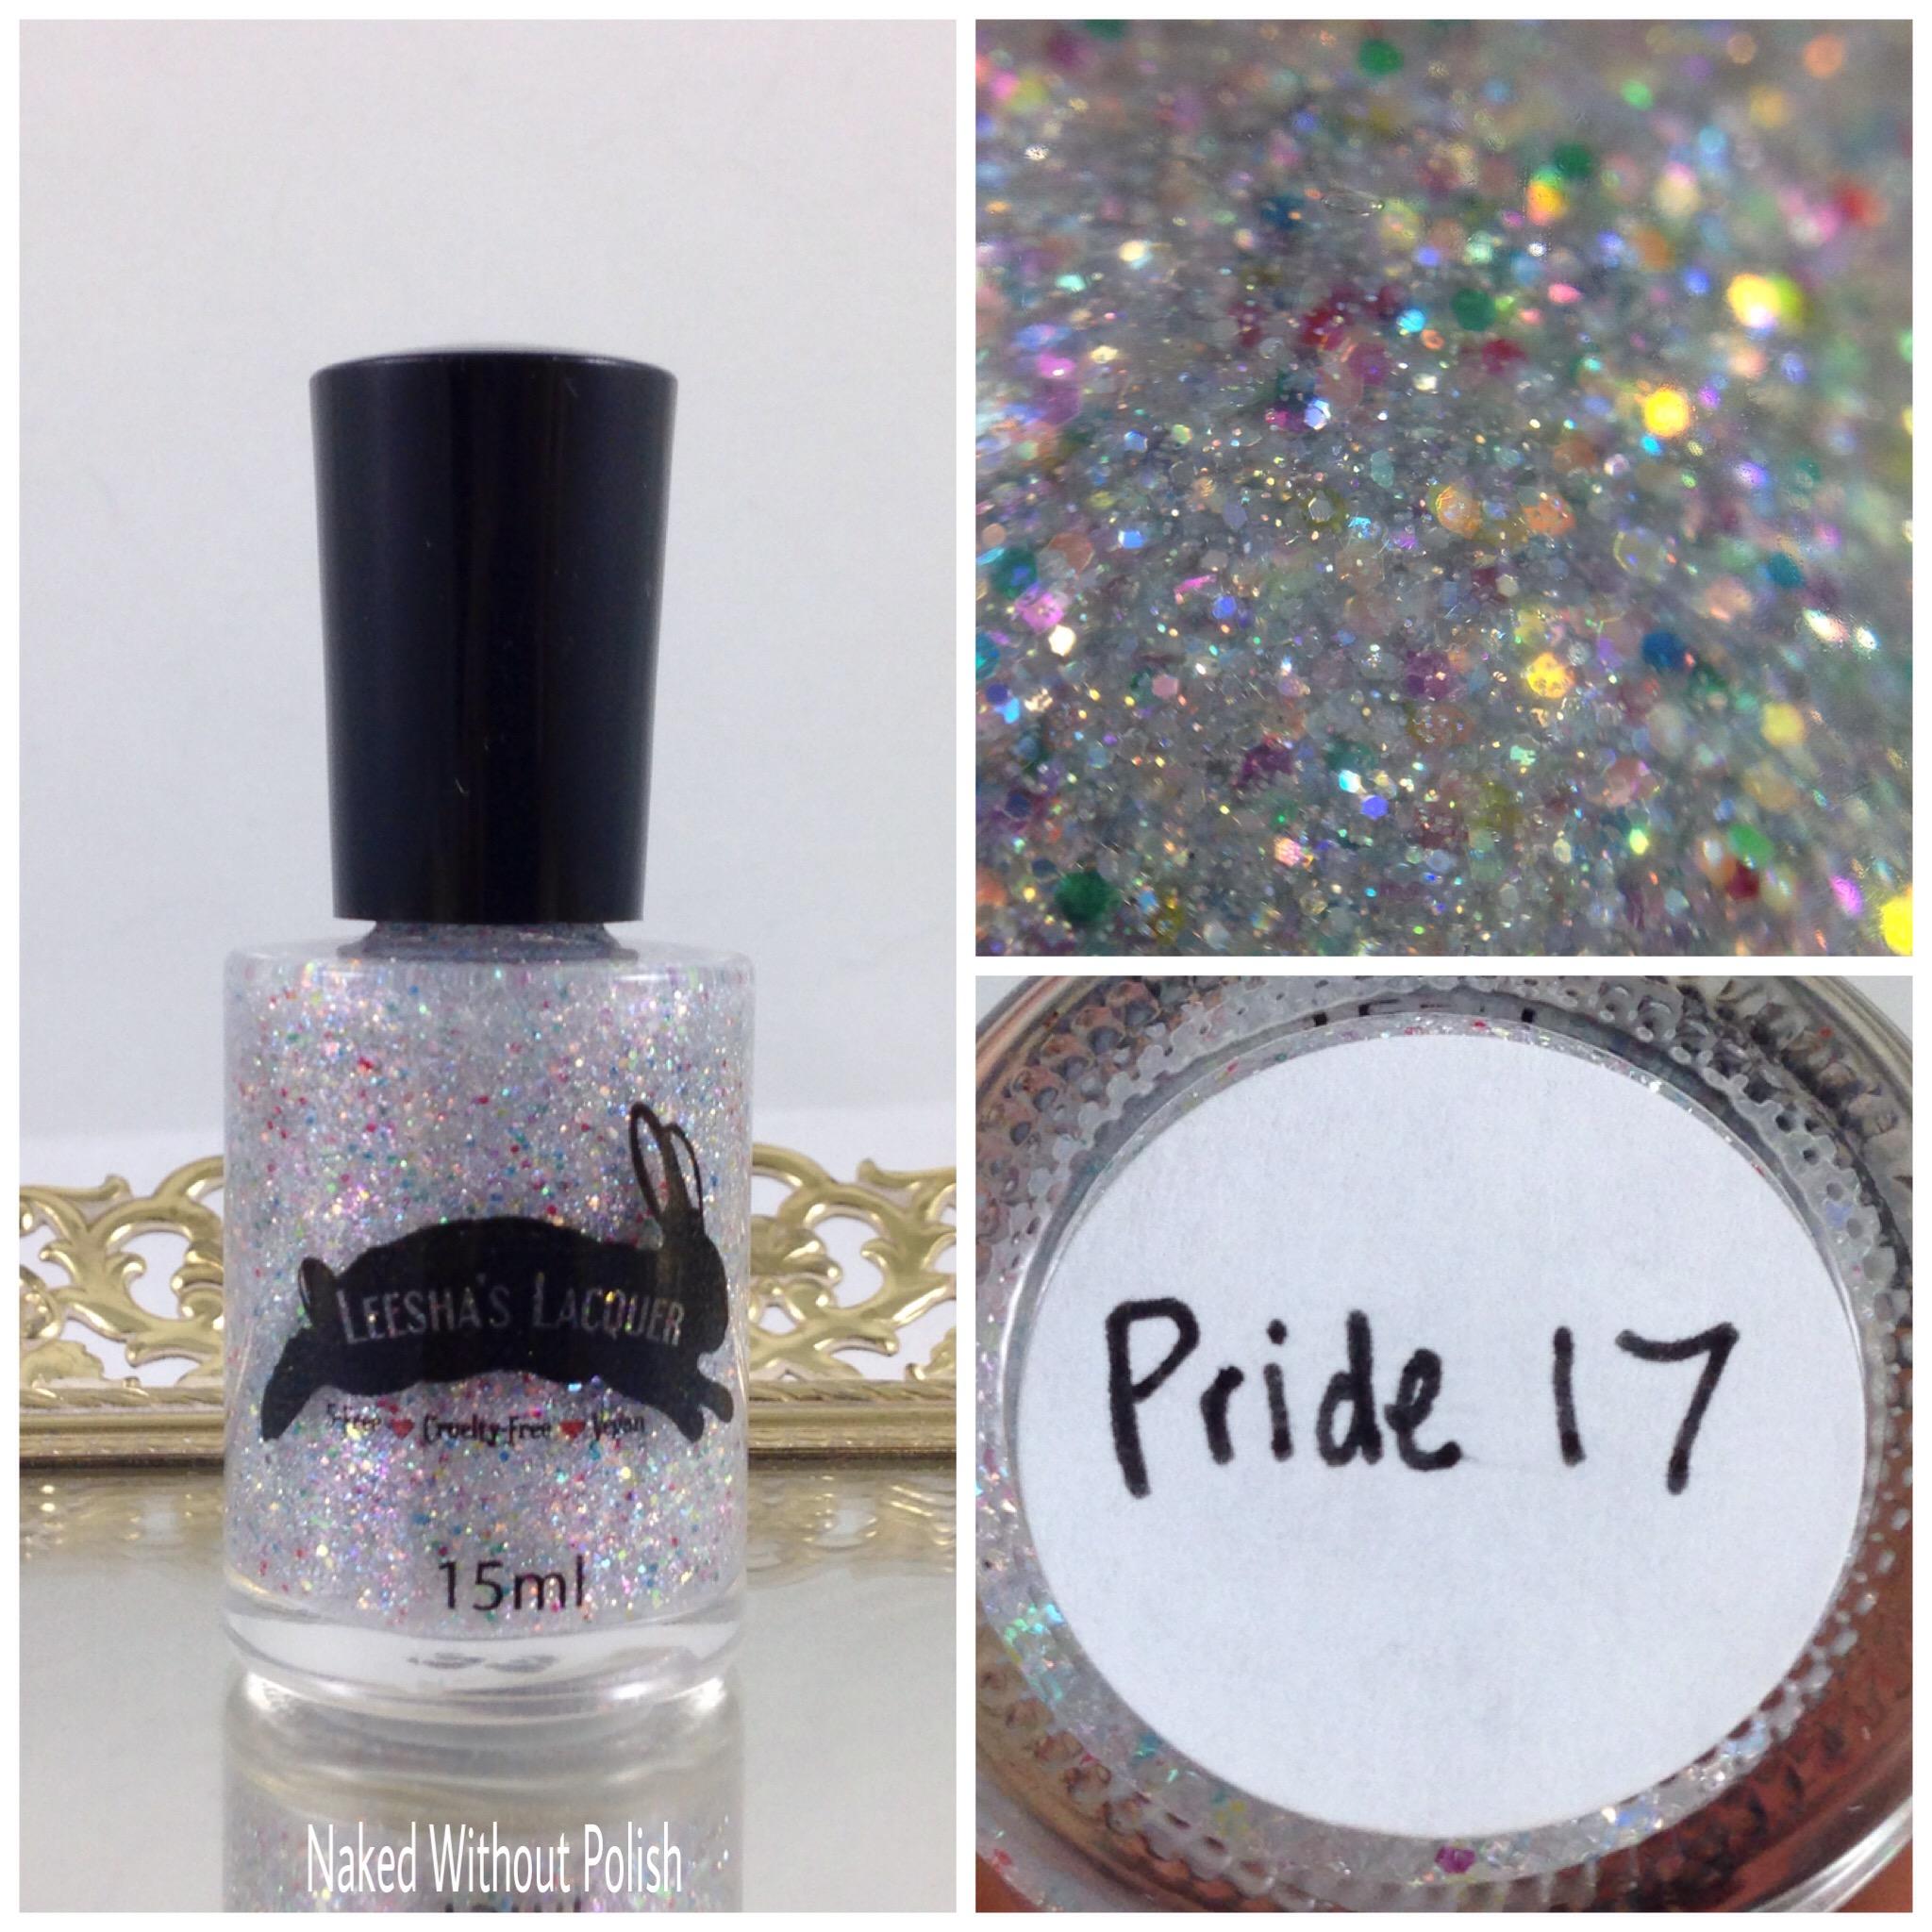 Leeshas-Lacquer-Pride-17-1